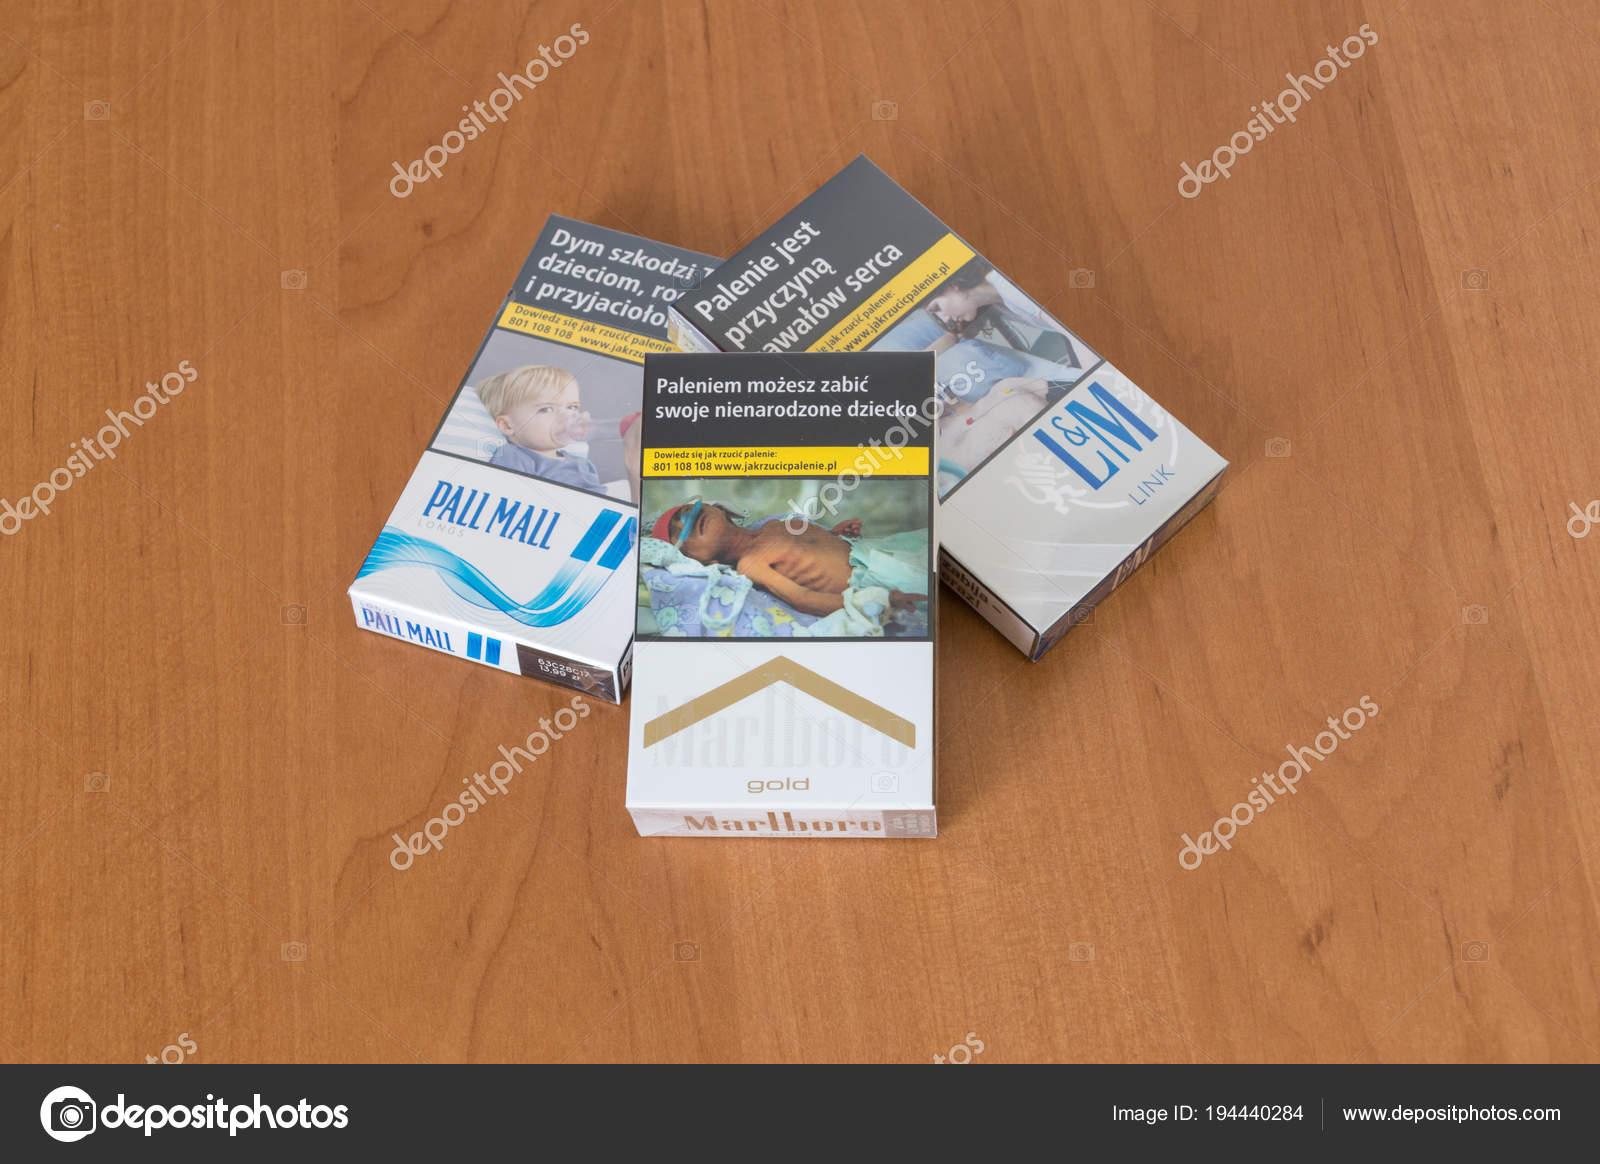 Marlboro cigarettes shipped to London